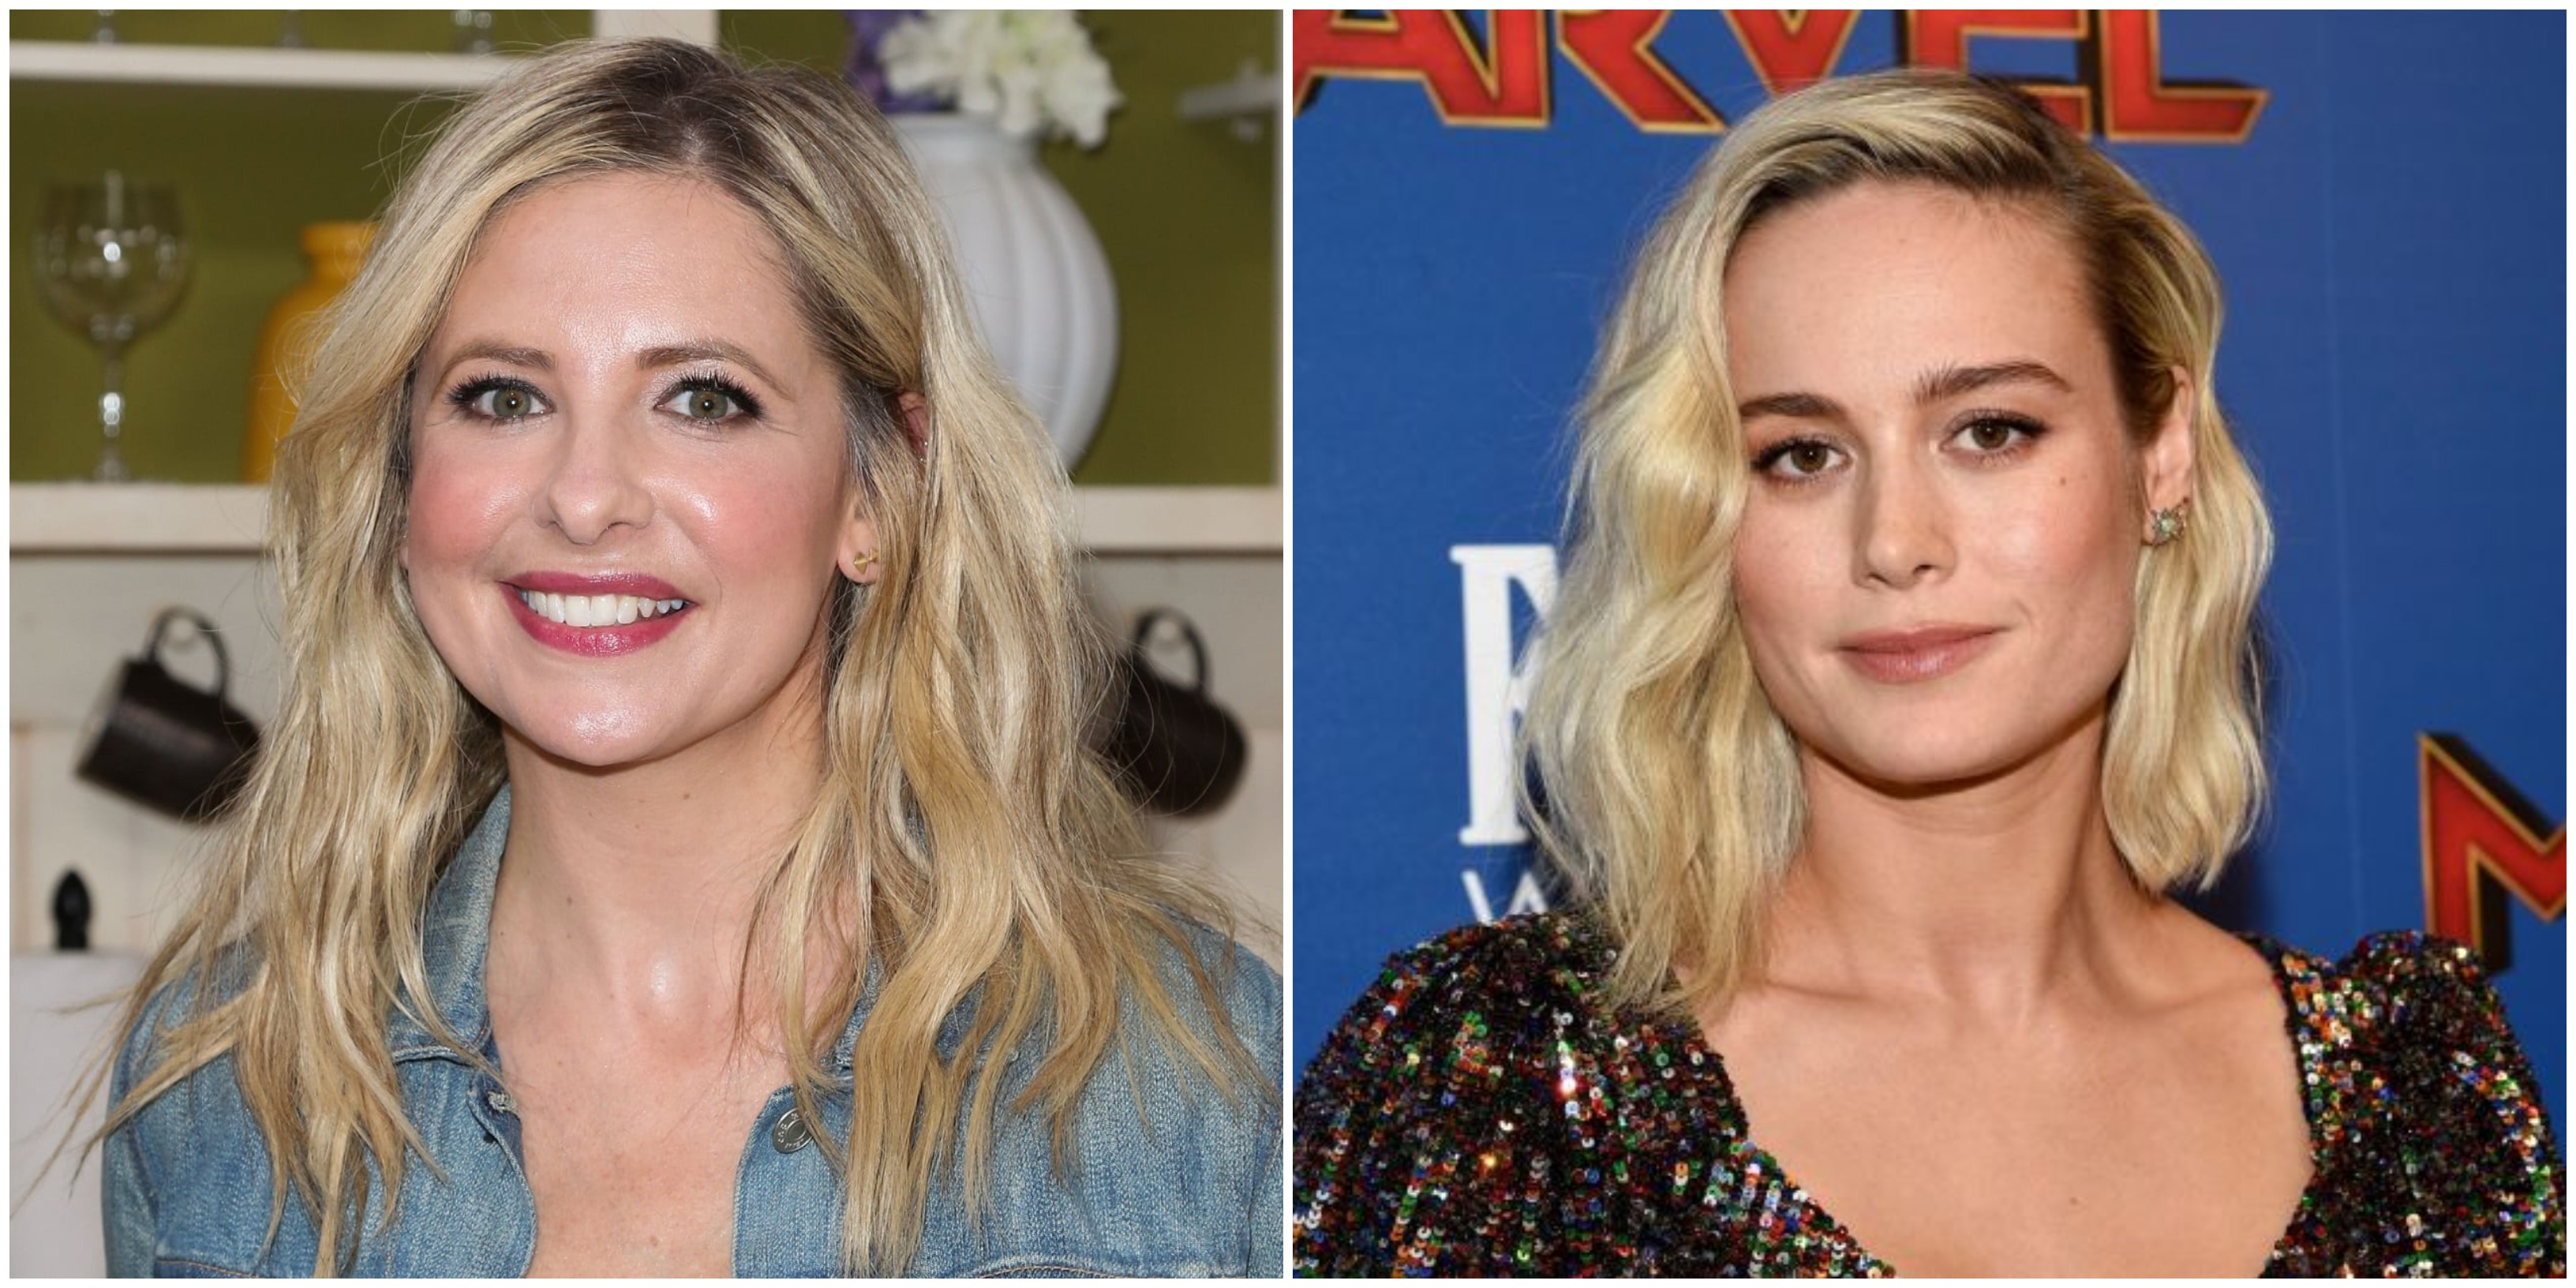 Halloween 2019: Sarah Michelle Gellar è Marty McFly, Brie Larson Britney Spears. I costumi delle star